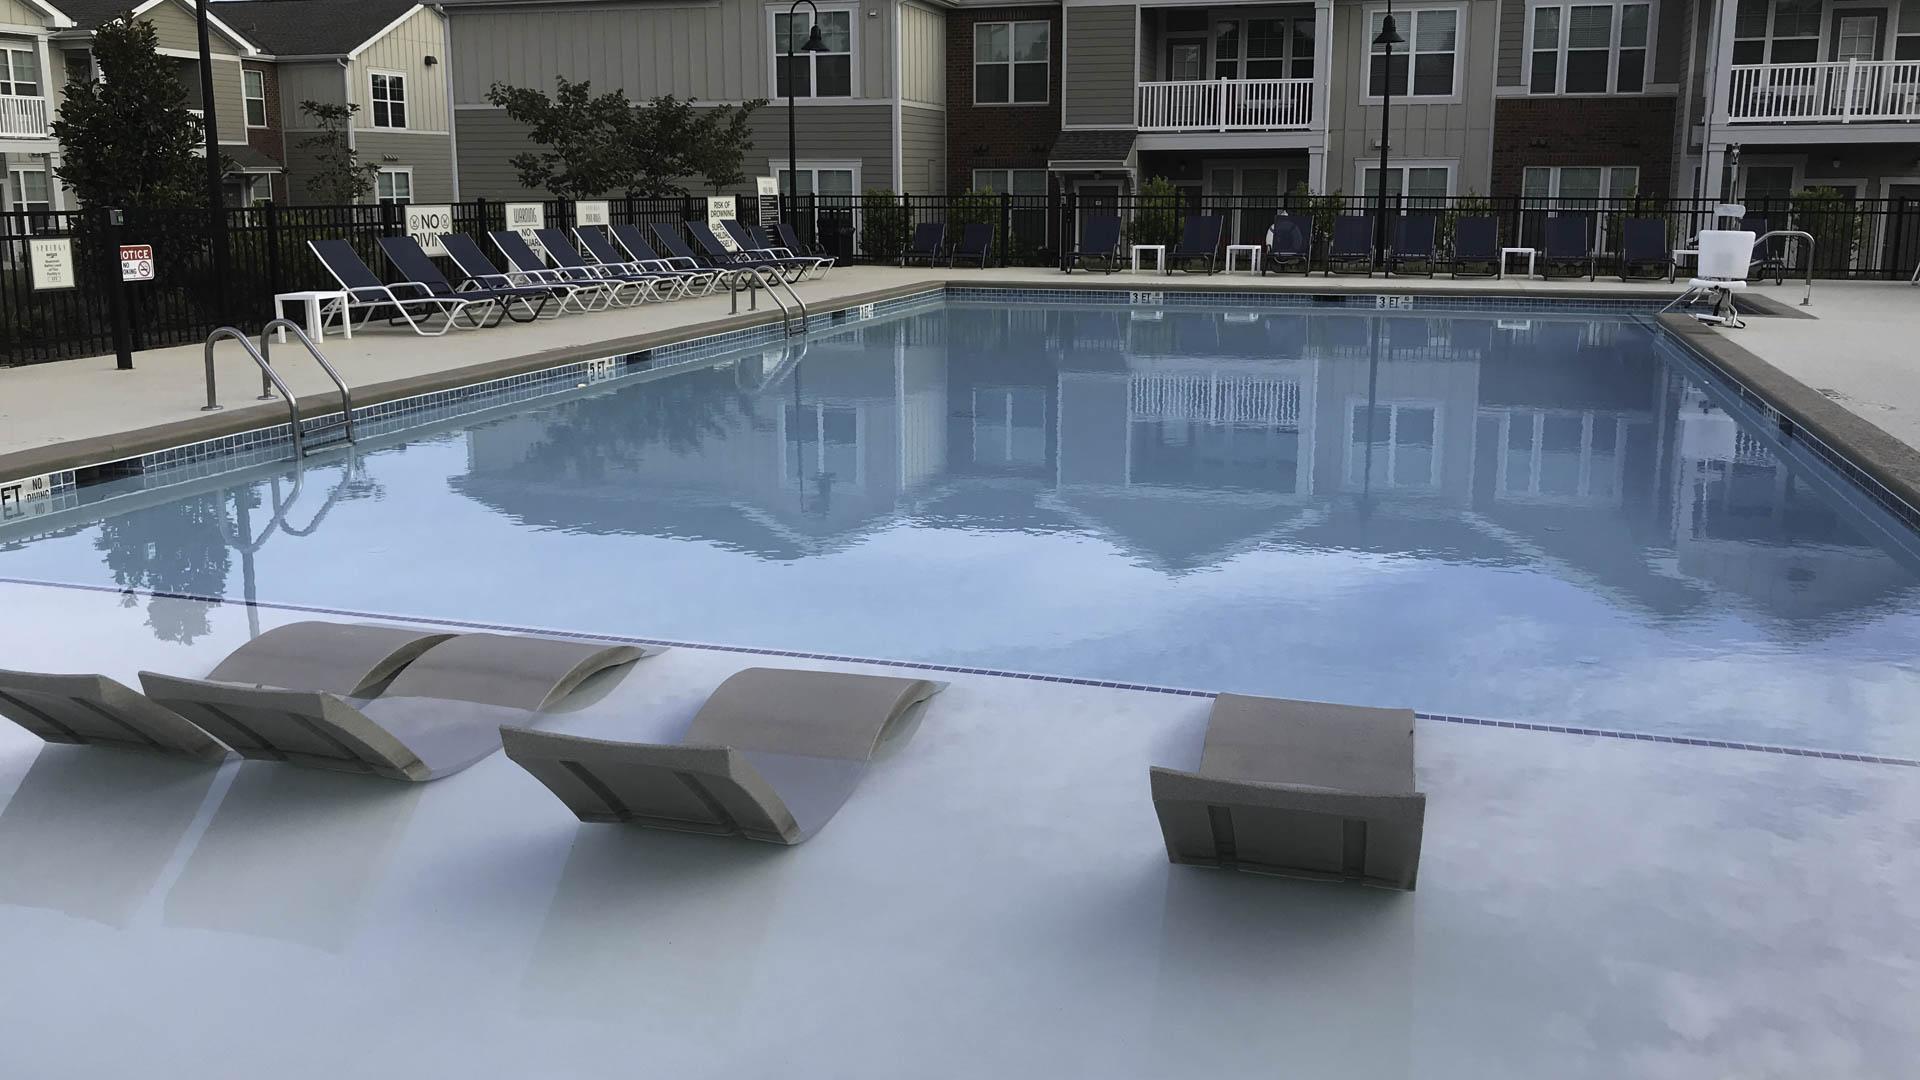 Springs at McDonough pool